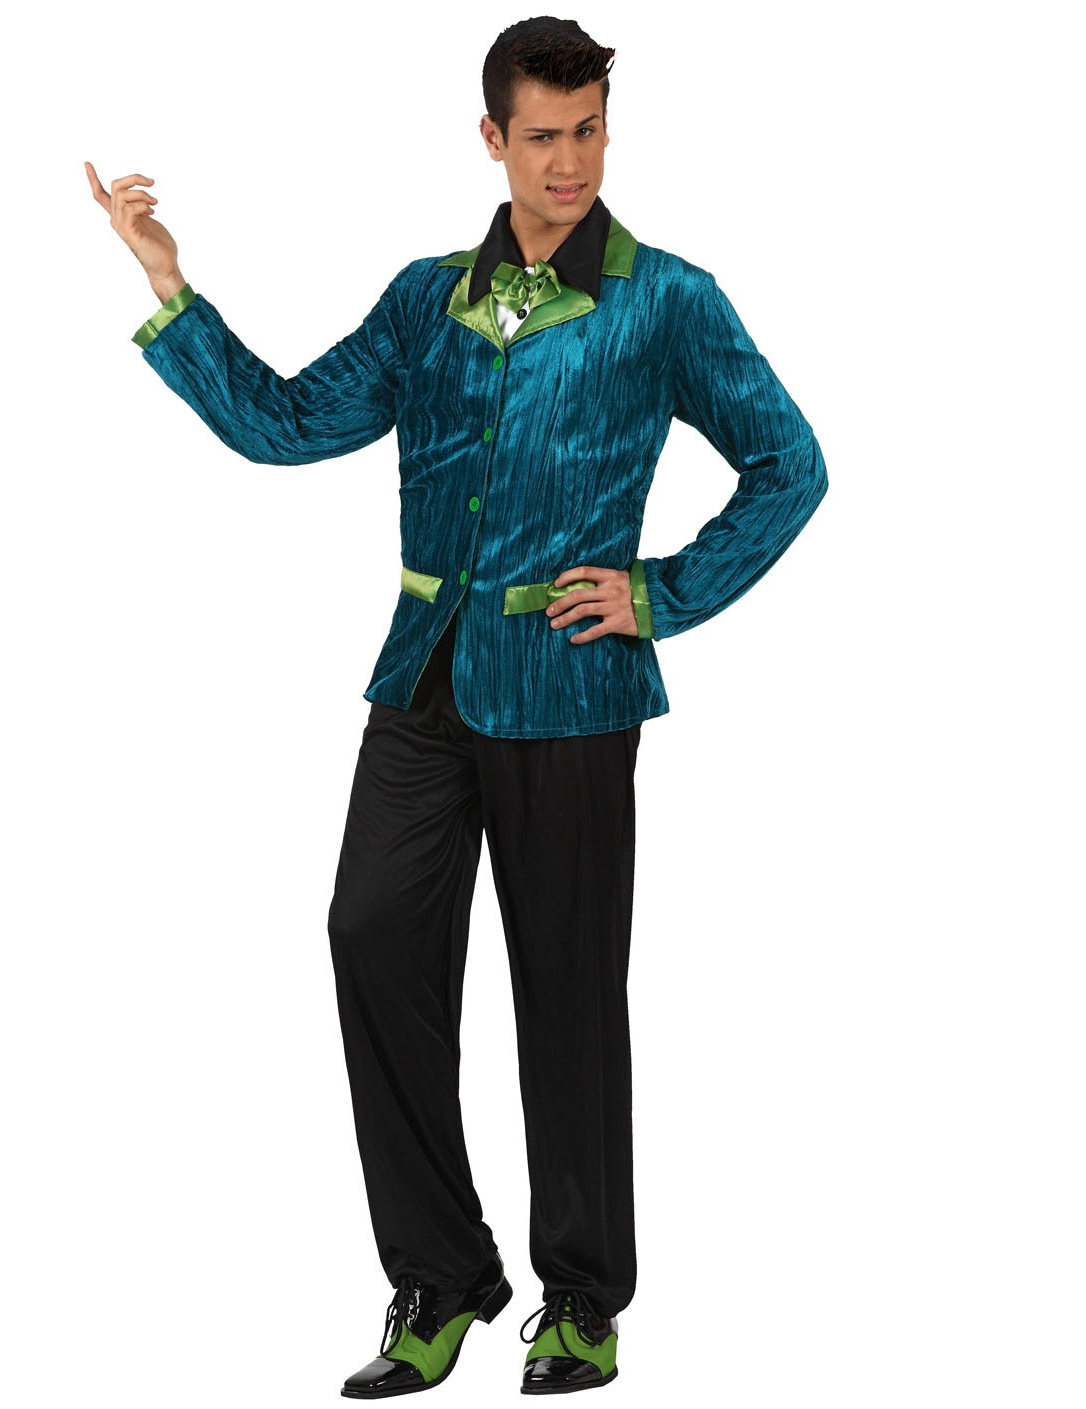 d guisement style ann es 60 bleu et vert homme. Black Bedroom Furniture Sets. Home Design Ideas